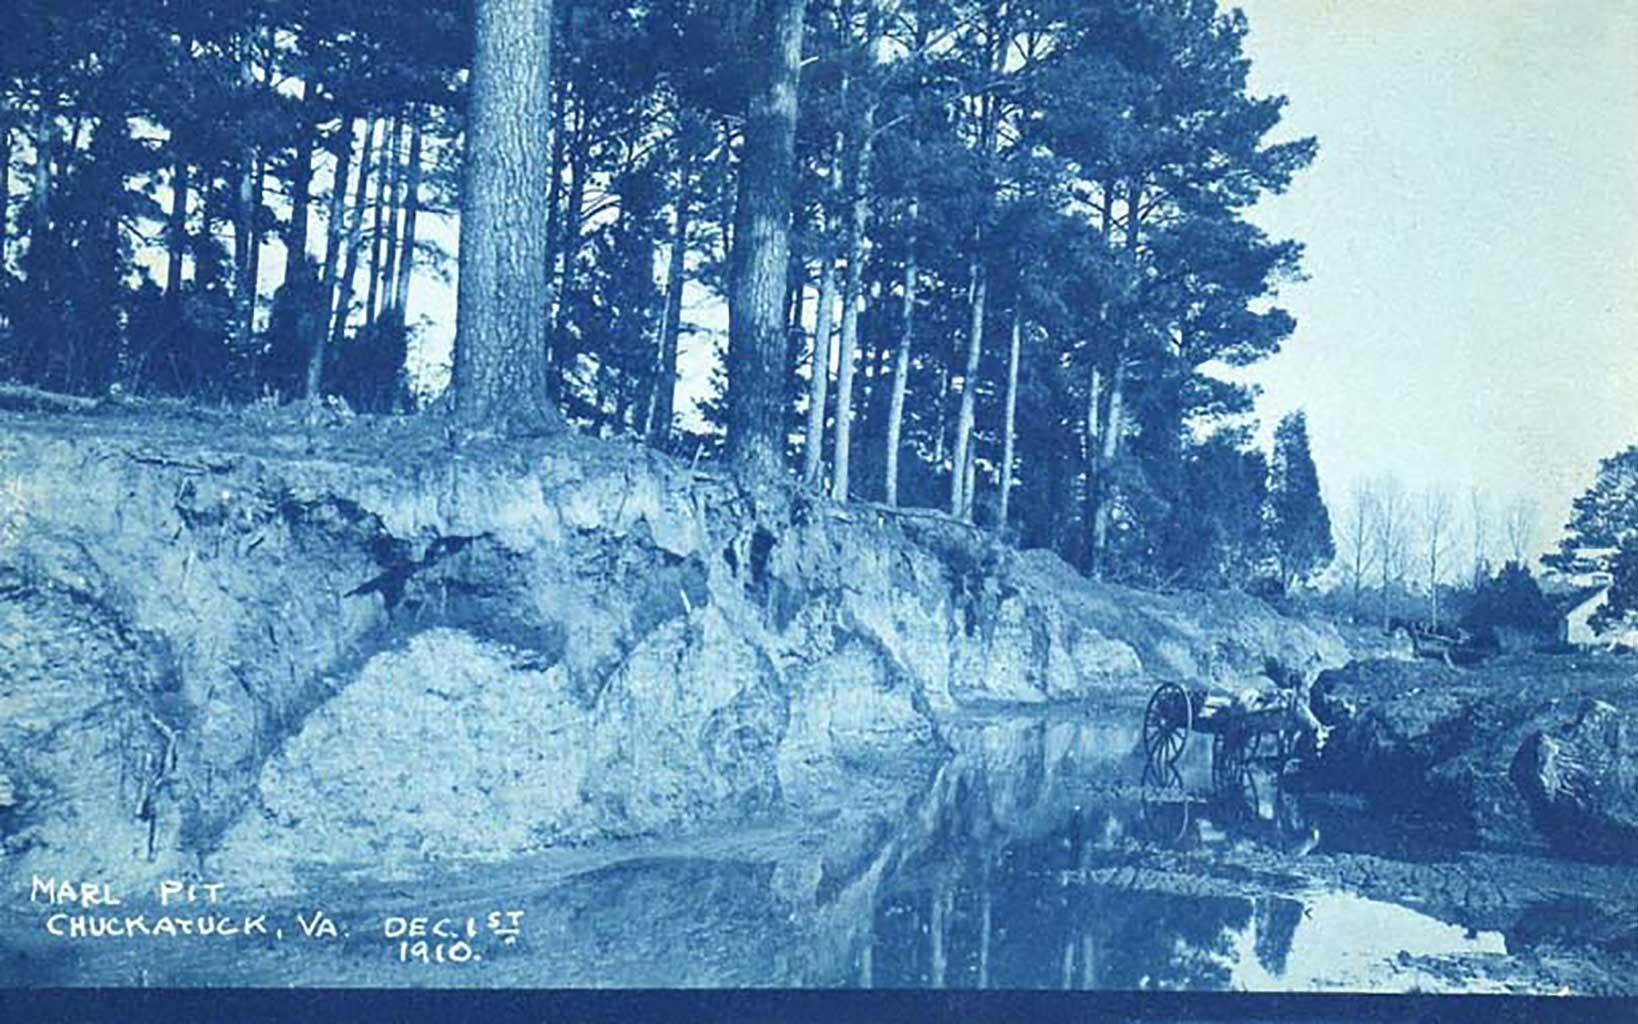 marl-pit-chuckatuck-post-card-dec-1-1910-img111